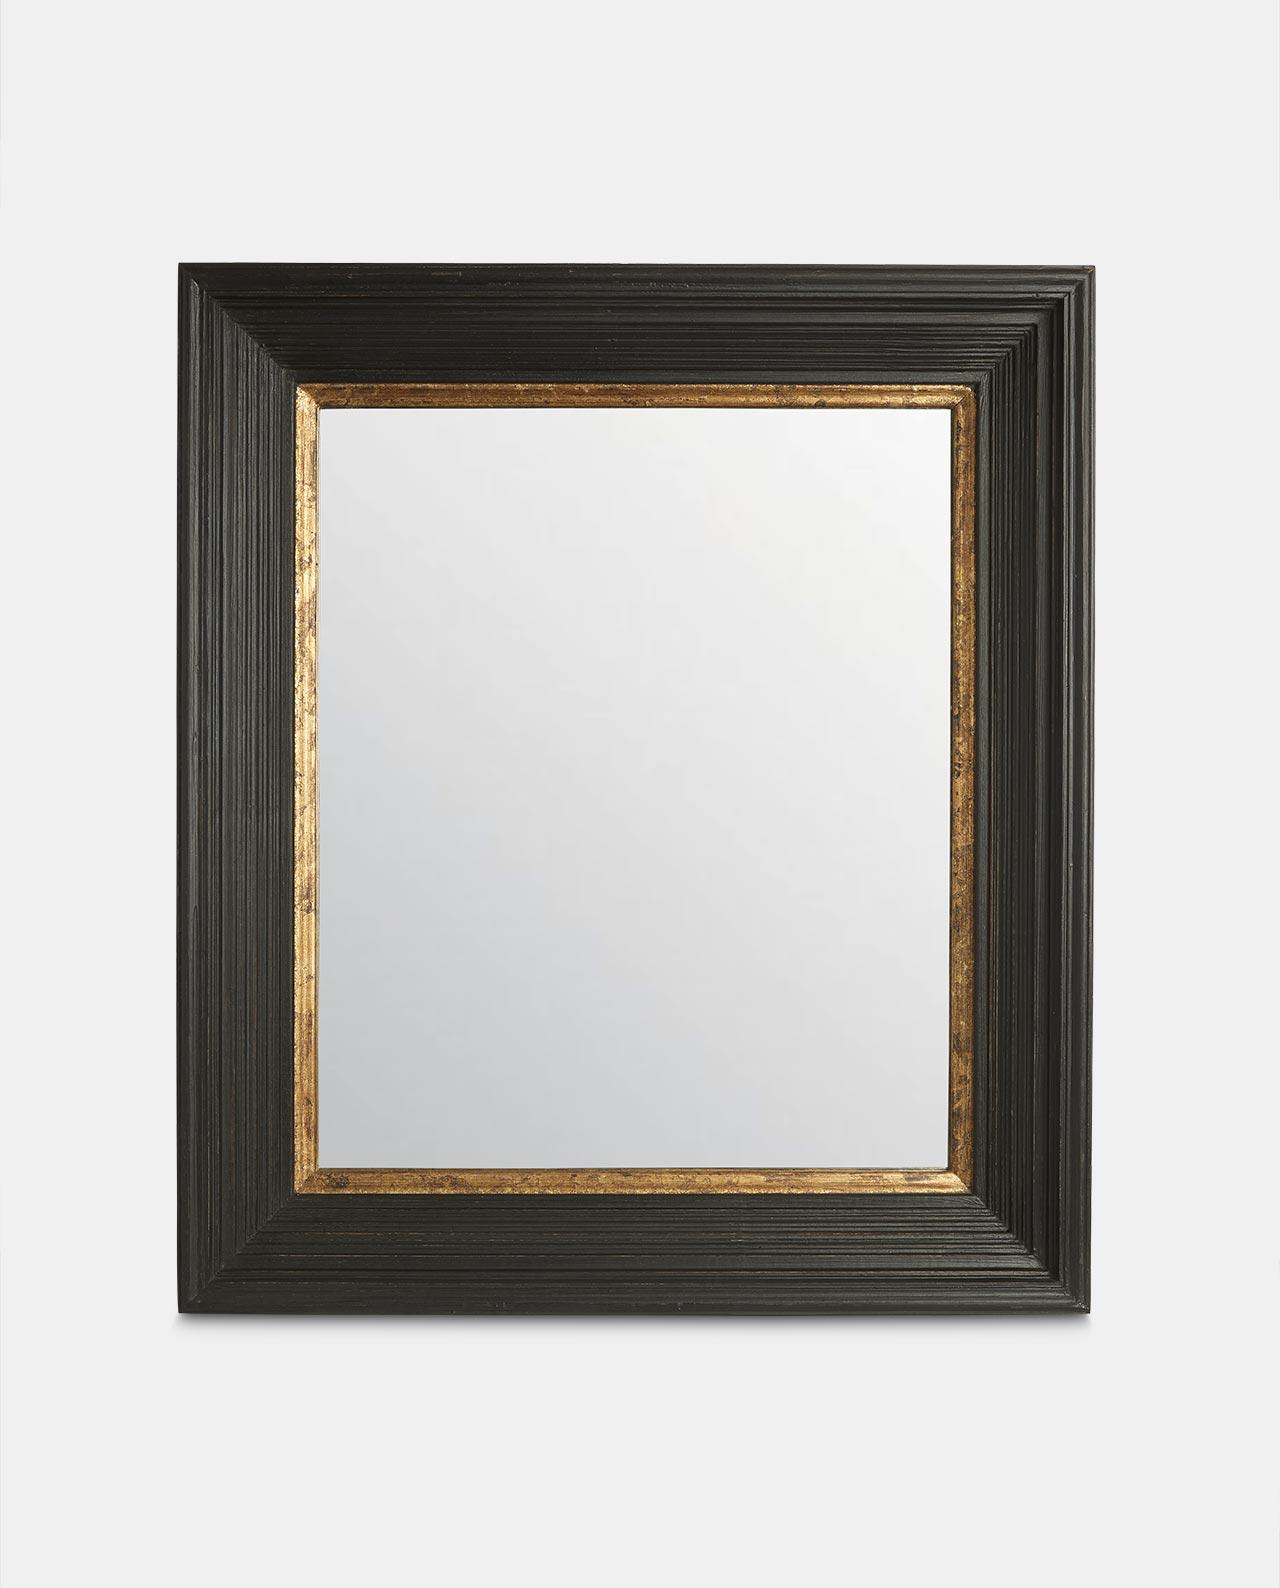 Altair Black & Gold Mirror 78cm x 68cm